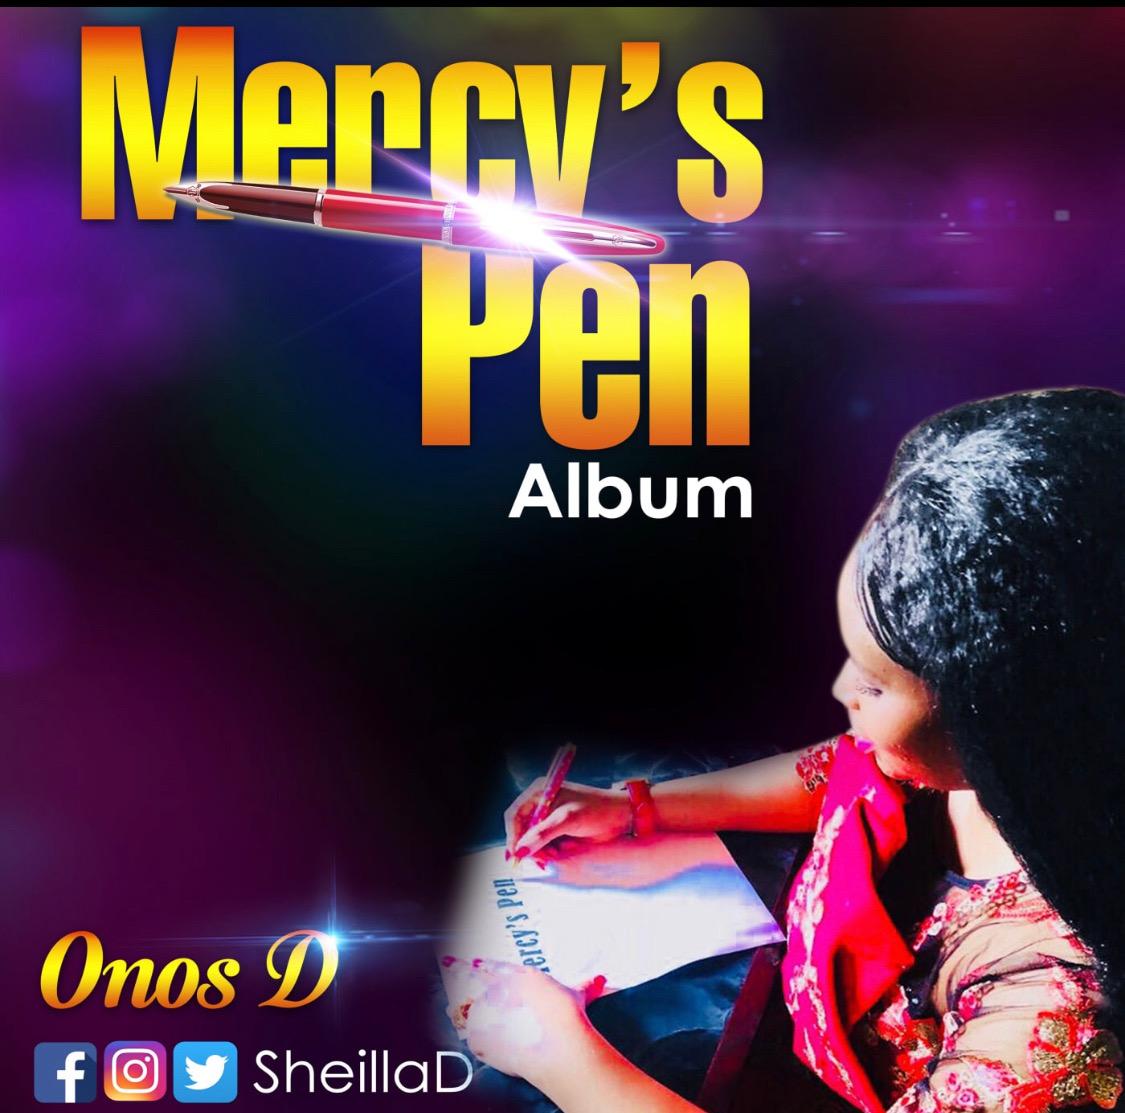 Onos D - Mercys Pen (Album) + Mp3 Download